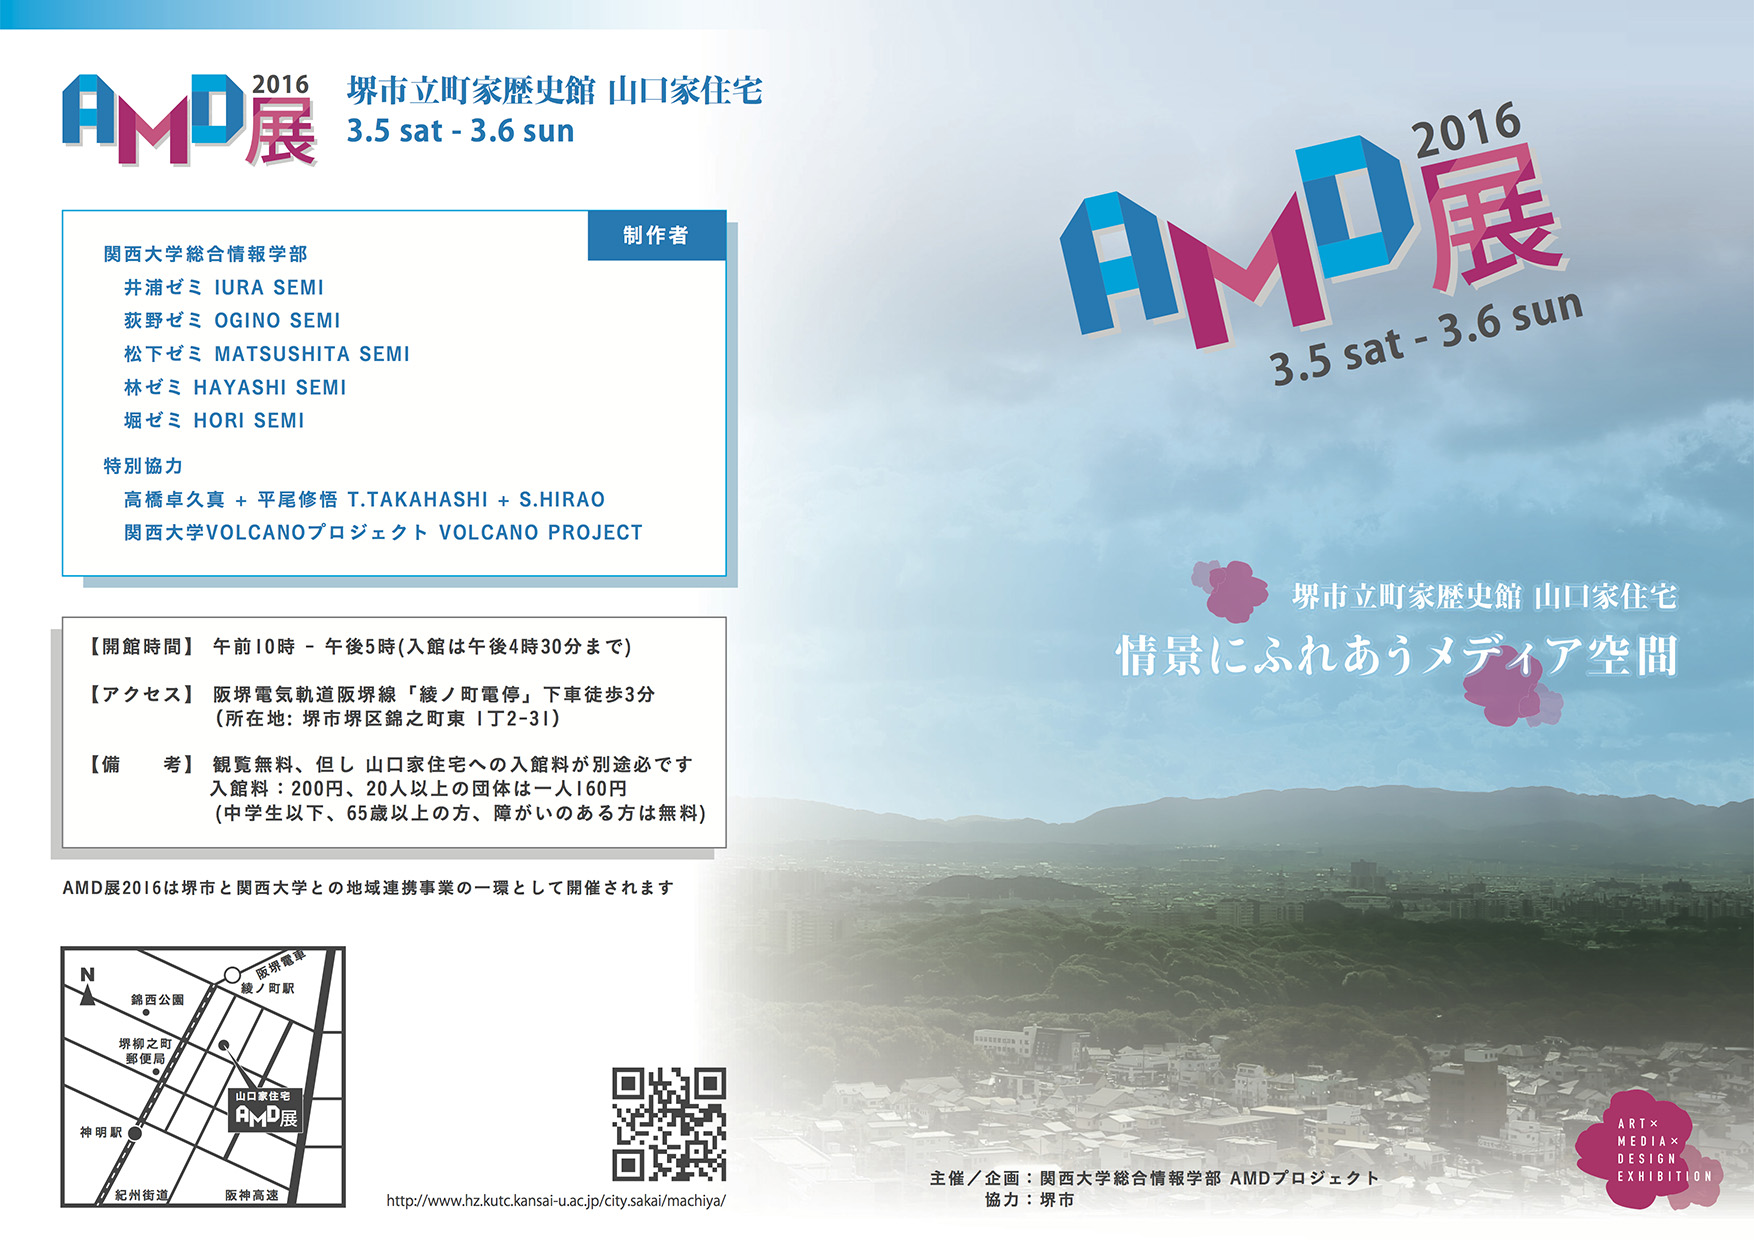 AMD2016_チラシ表.jpg